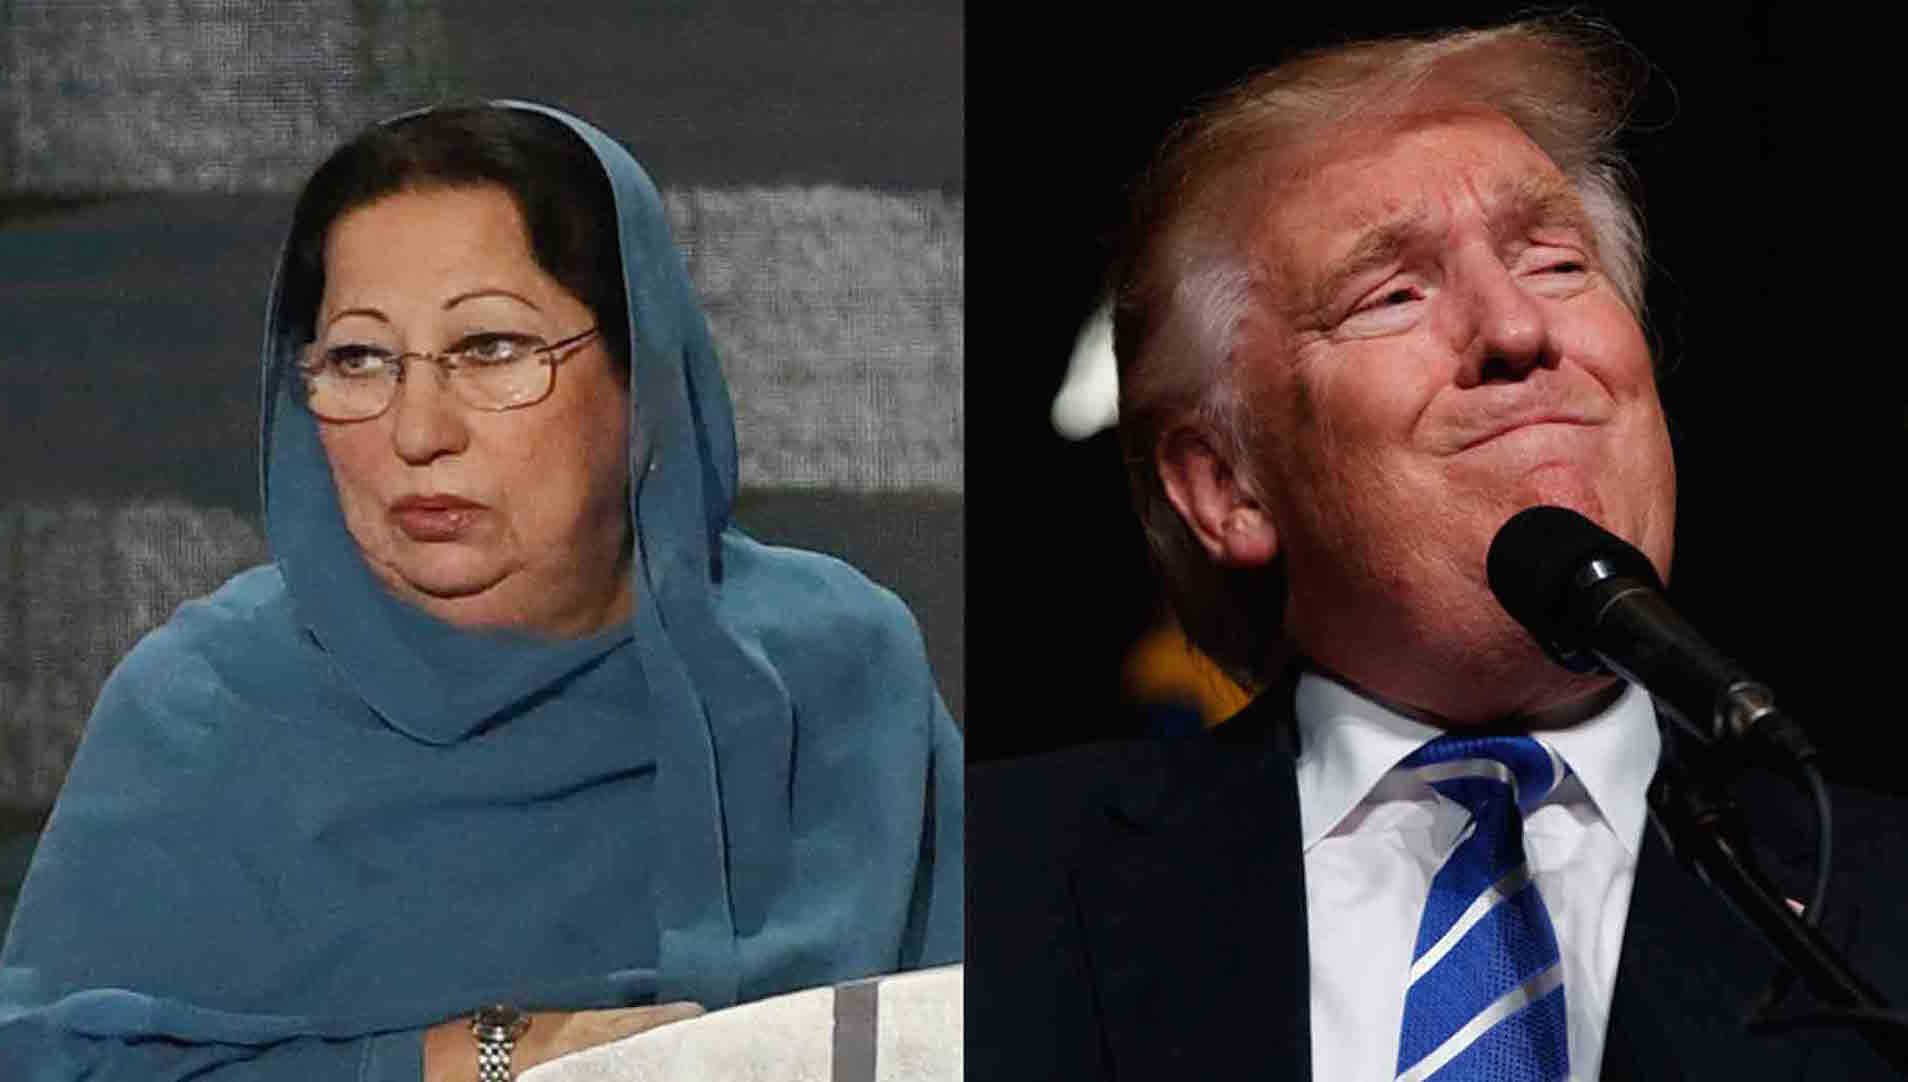 Republicans denounce Trump as confrontation with Muslim parents escalates